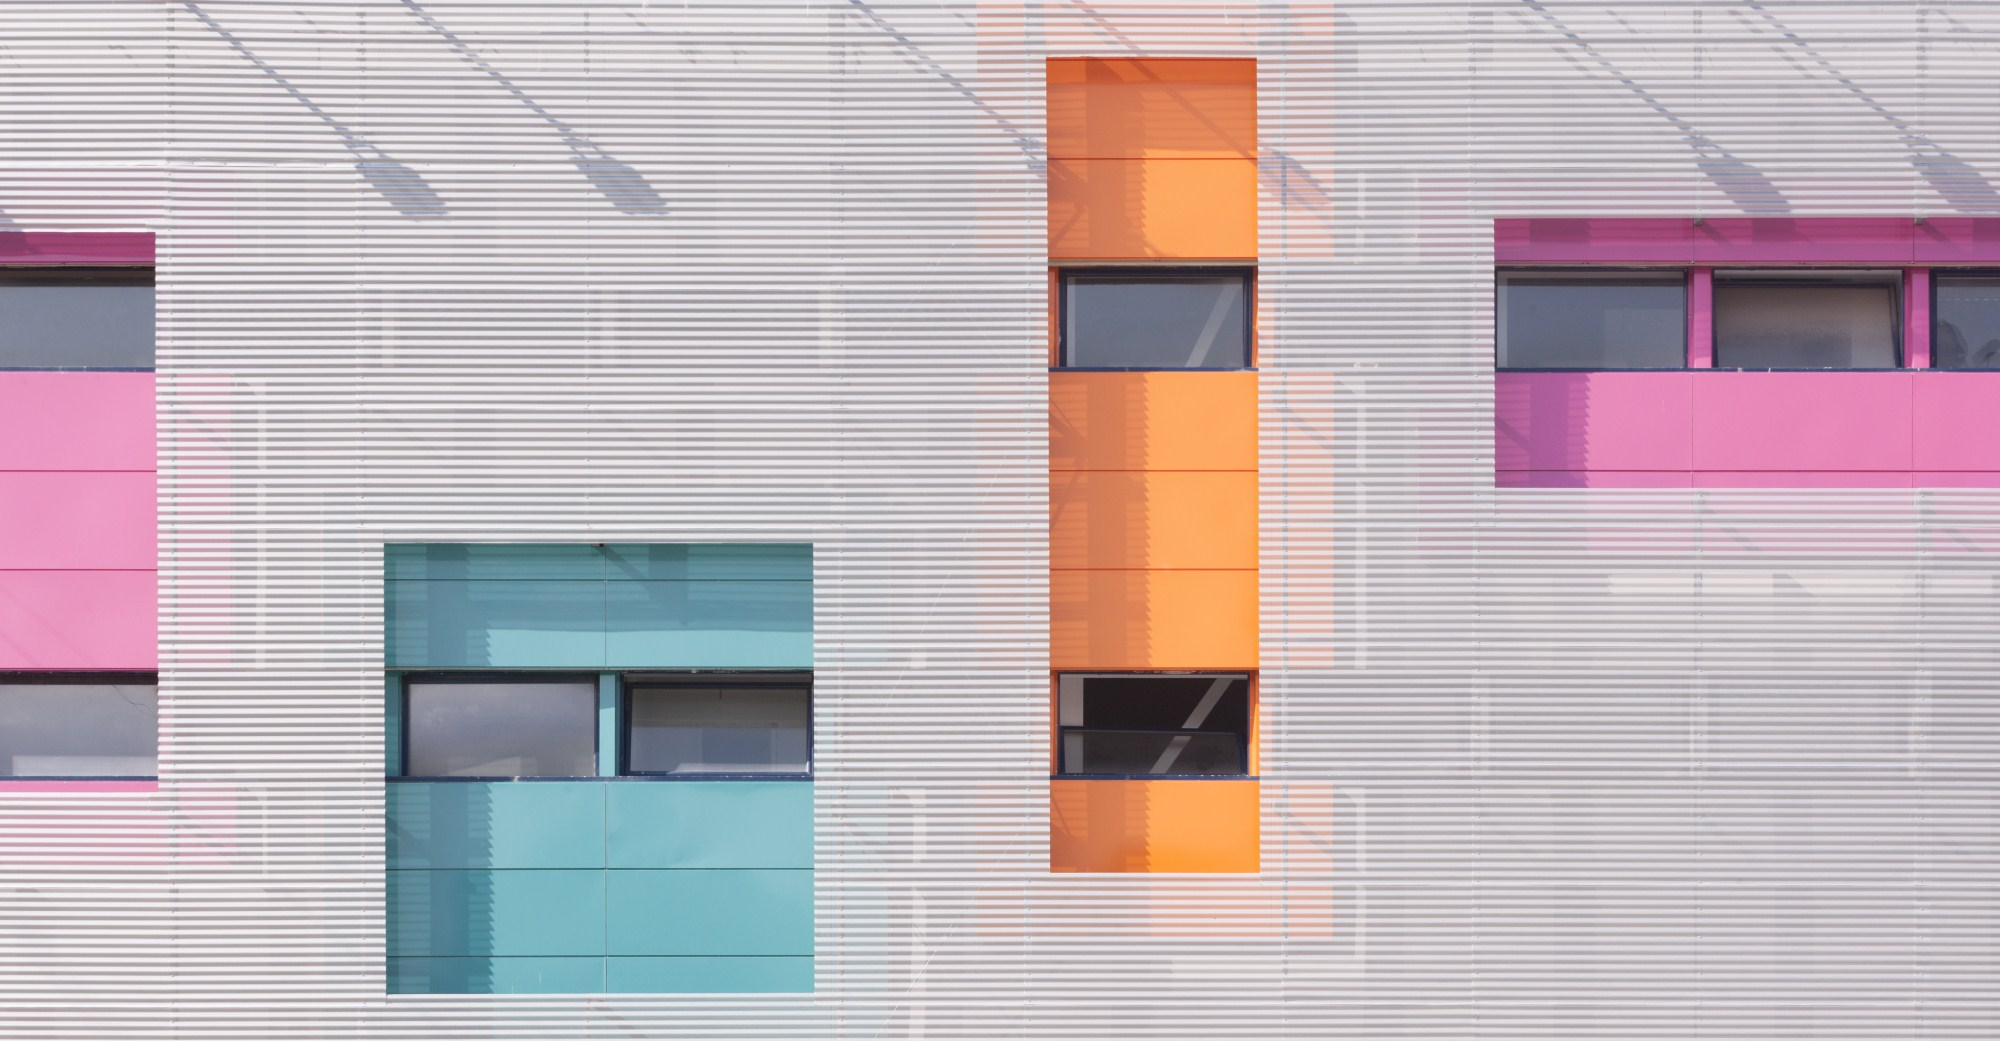 https://nbc-arhitect.ro/wp-content/uploads/2020/10/NBC-Arhitect-_-HD-MALL-_-Bucharest-_-interior_design_mall_6.jpg